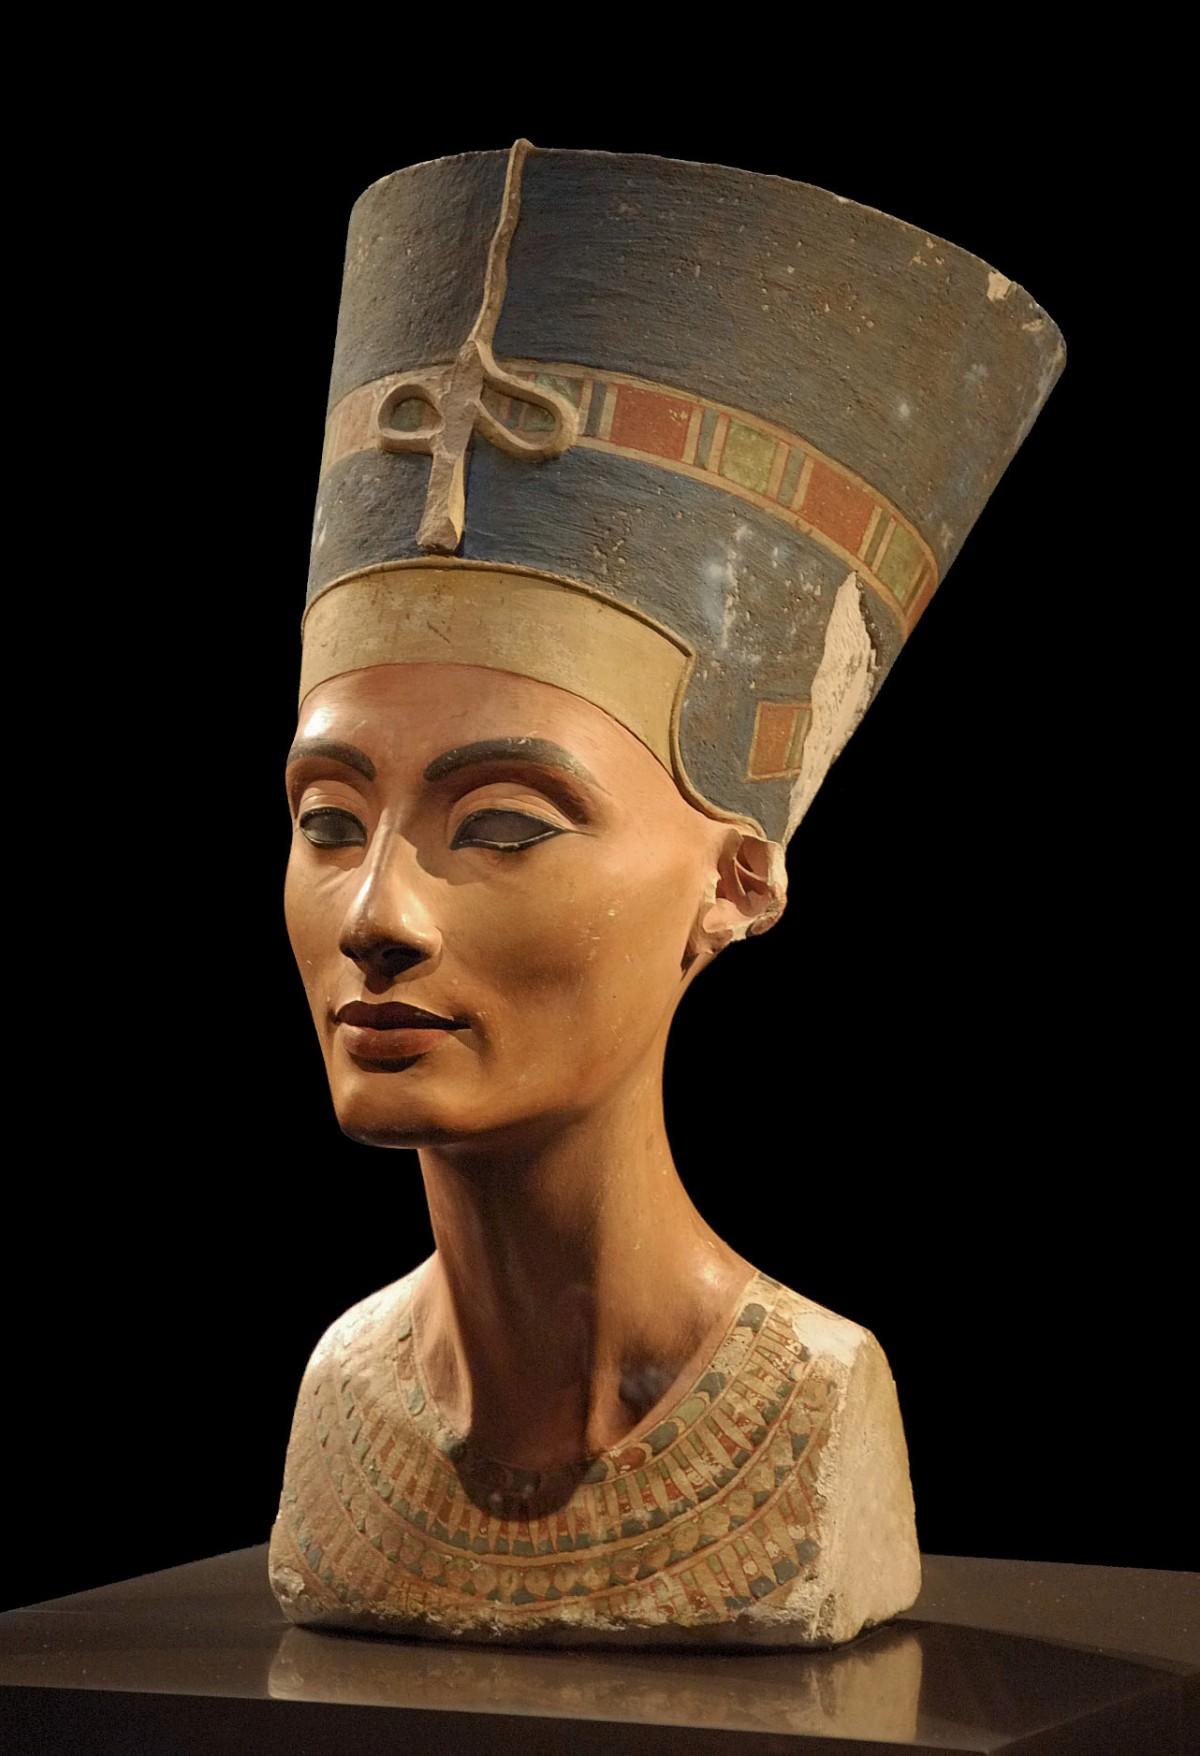 Nefertiti 1330 a. C., reina de la dinastía XVIII de Egipto, Gran Esposa Real de Akenatón